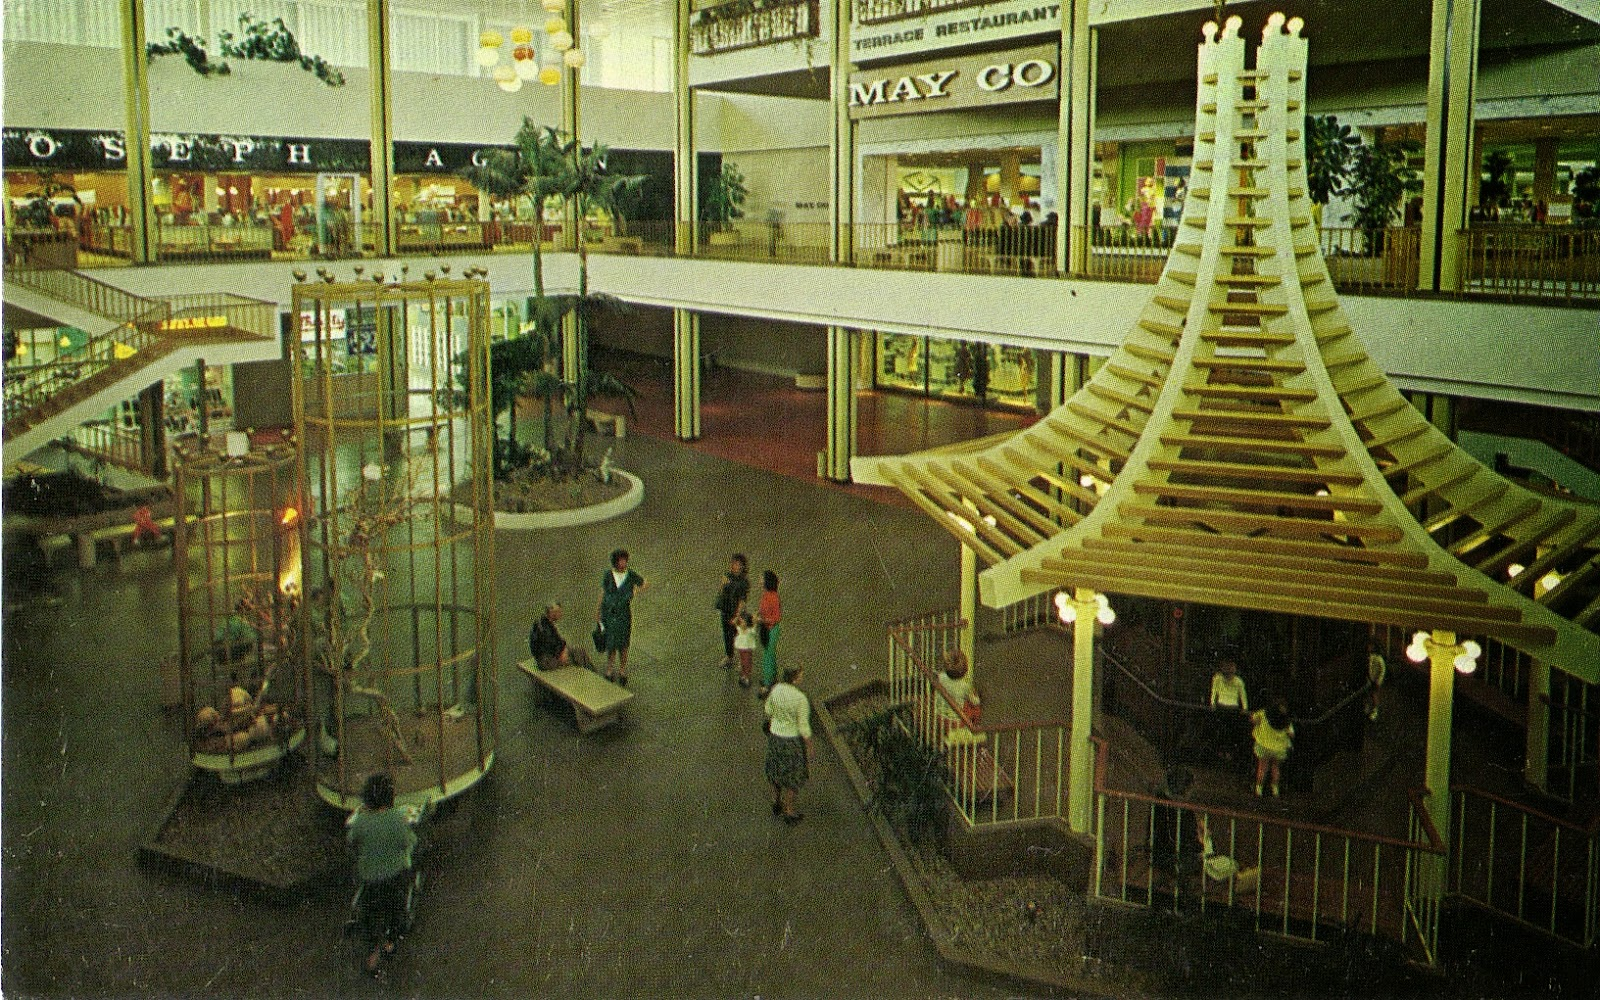 reviews of Louis Vuitton Topanga Plaza